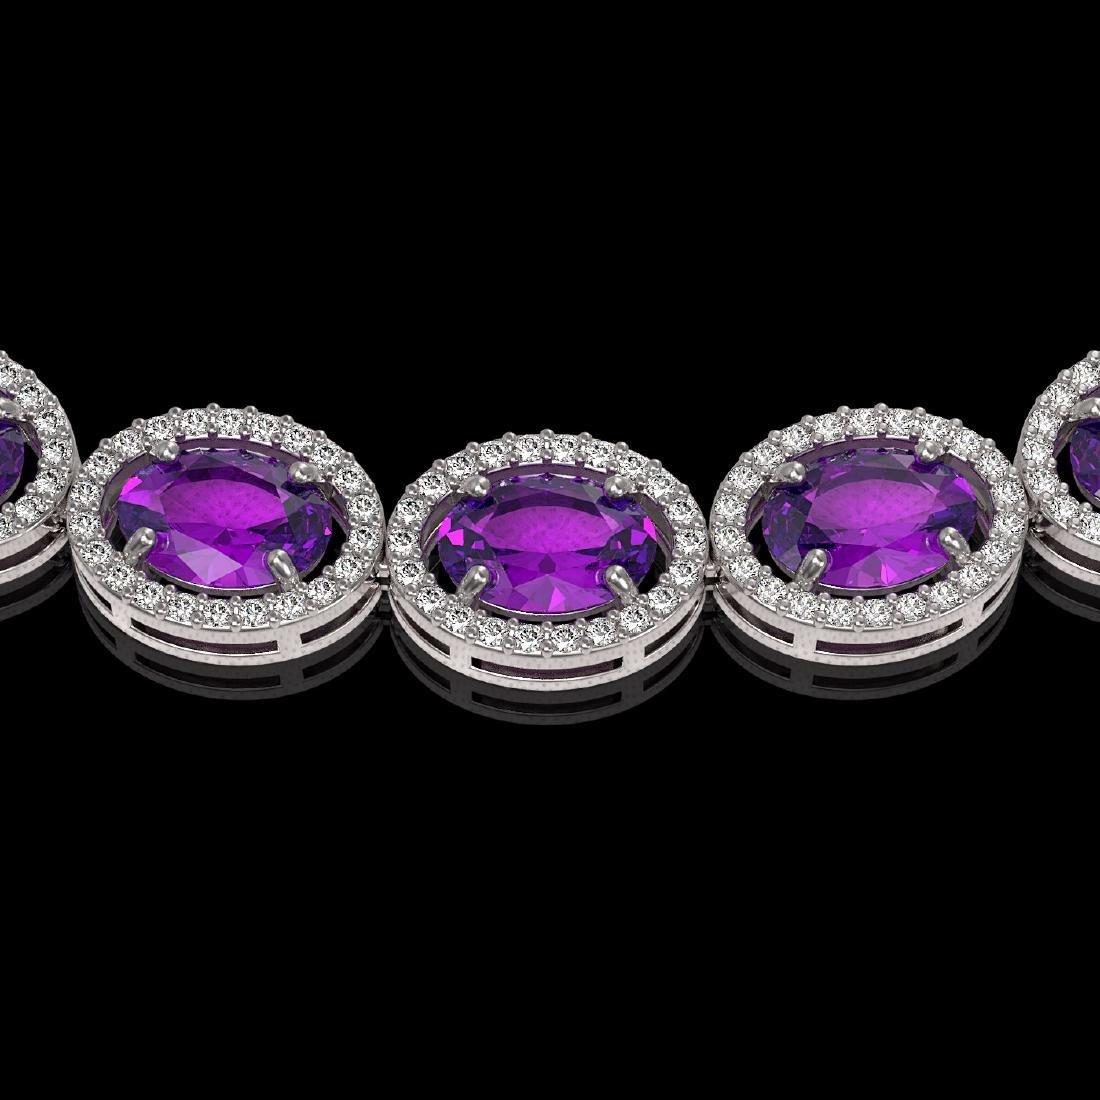 45.16 CTW Amethyst & Diamond Halo Necklace 10K White - 3